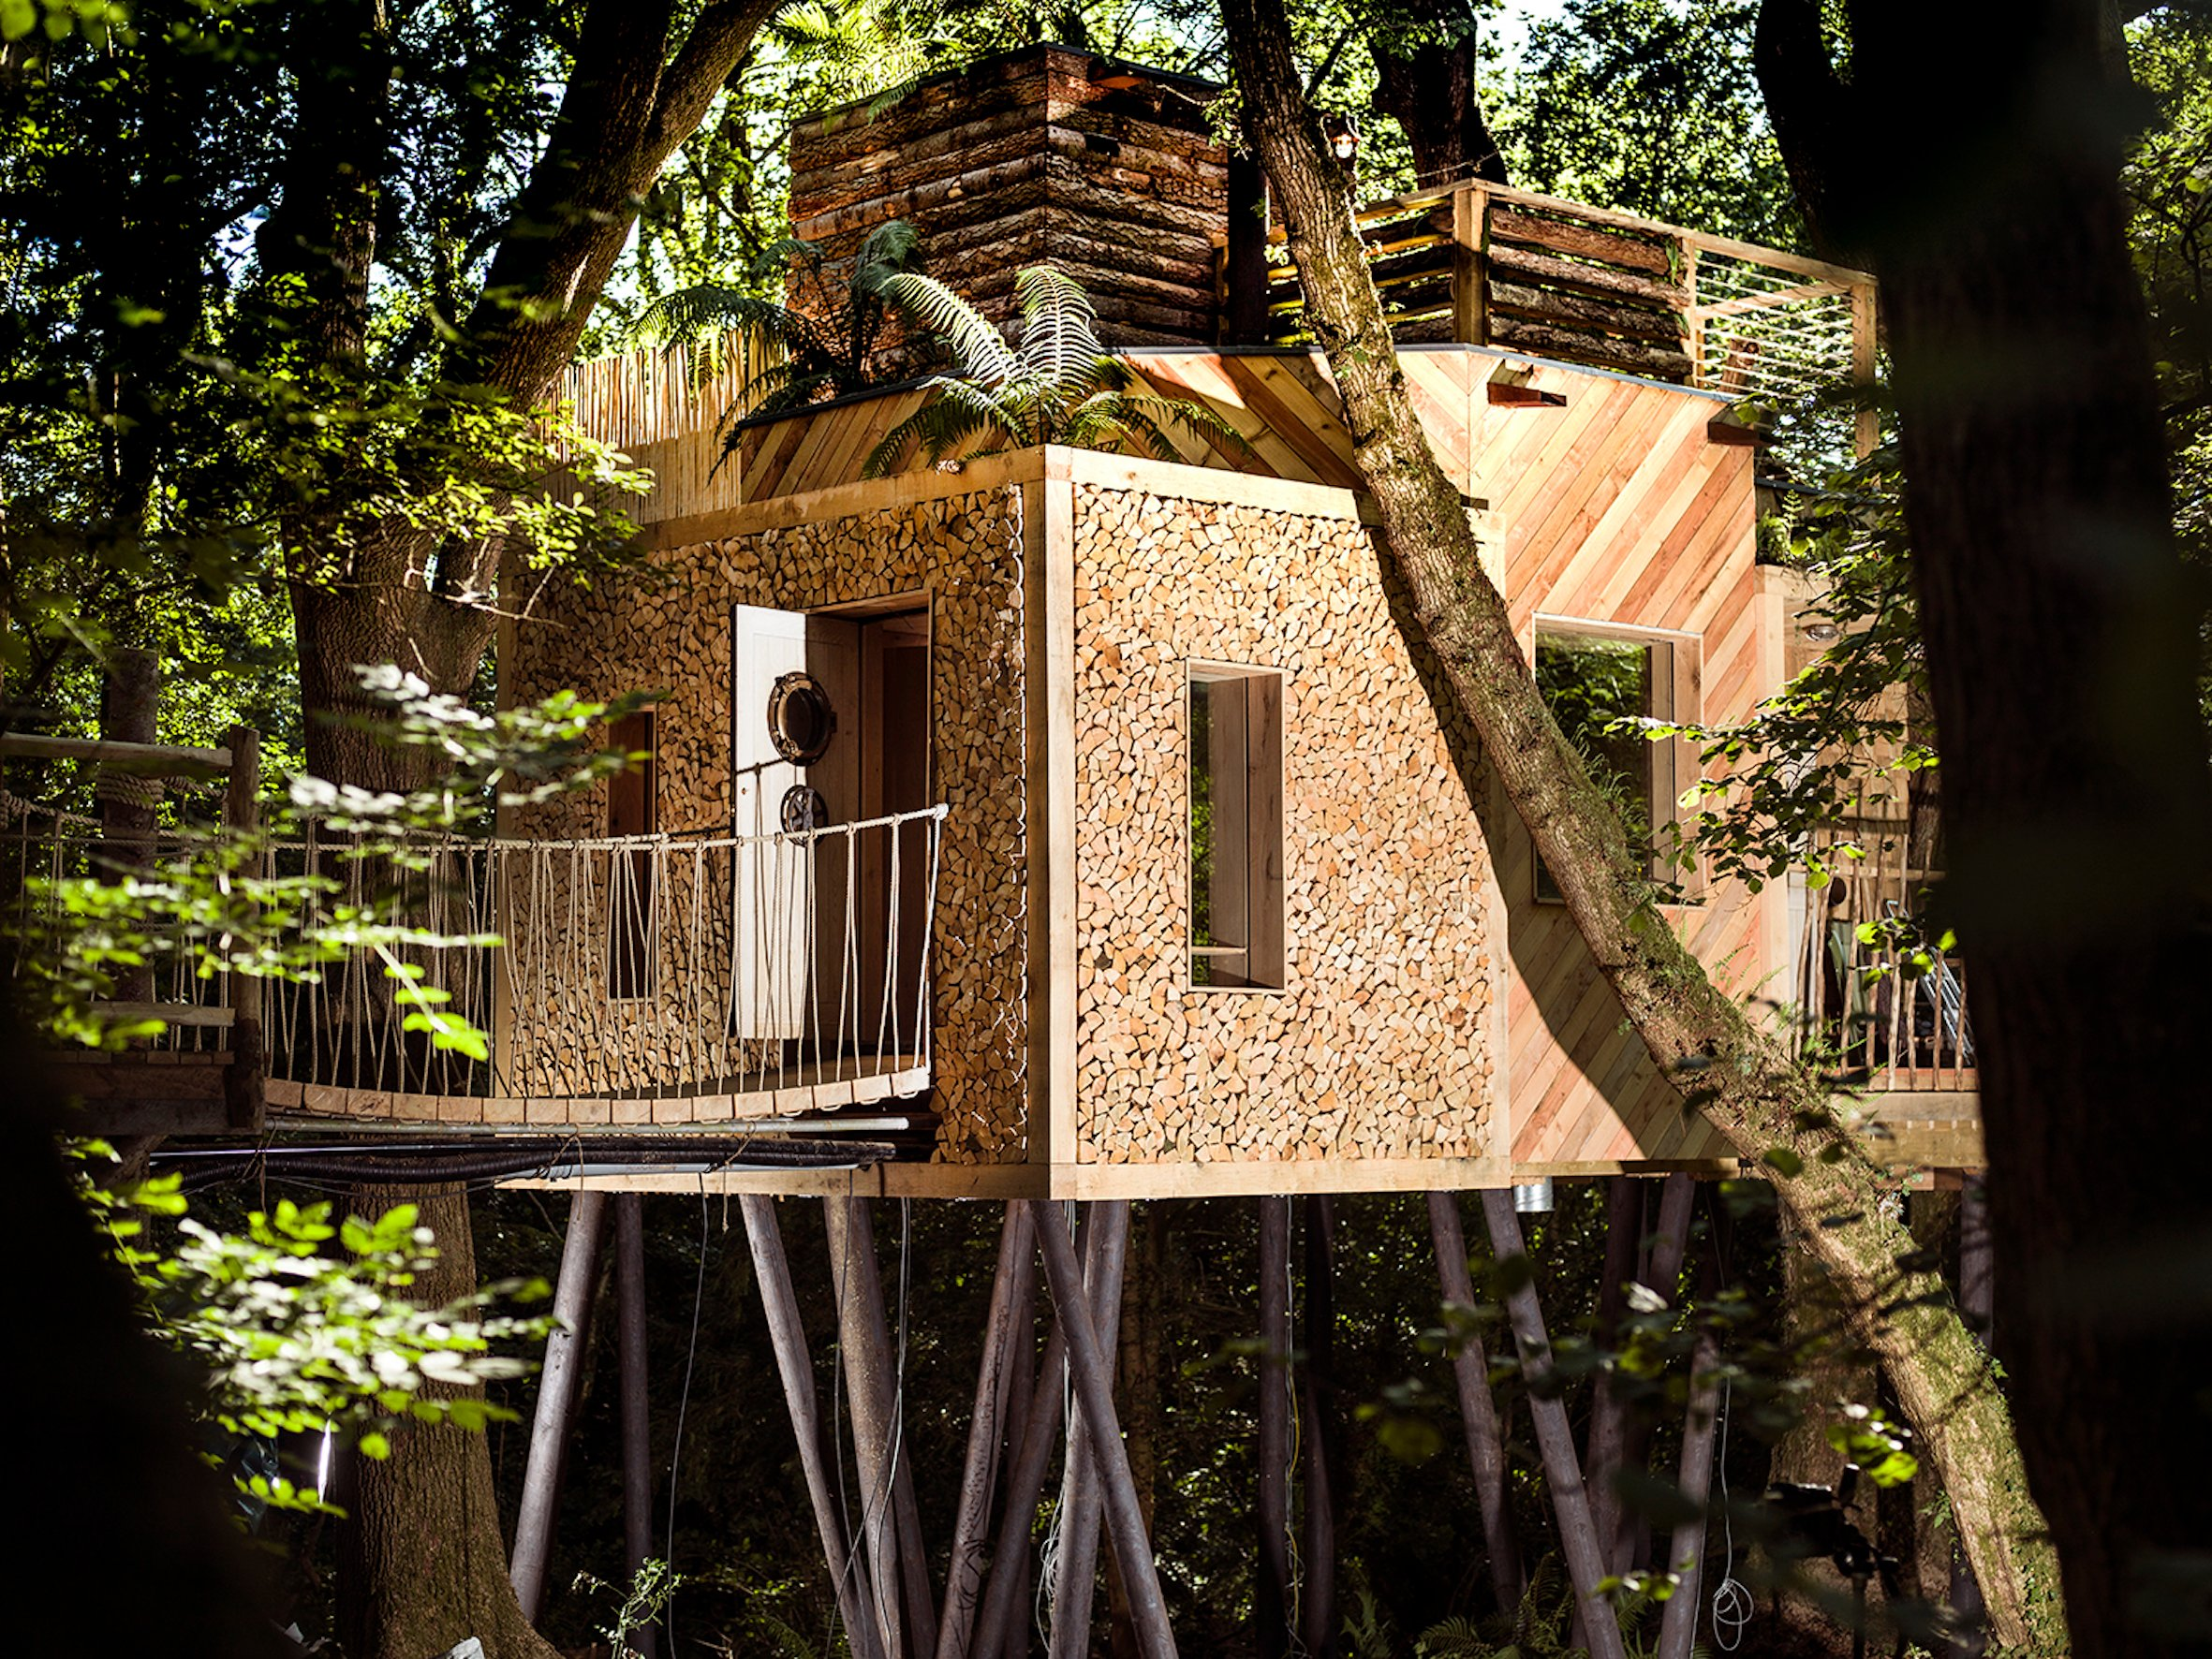 Crafty Camping & The Woodland Workshop